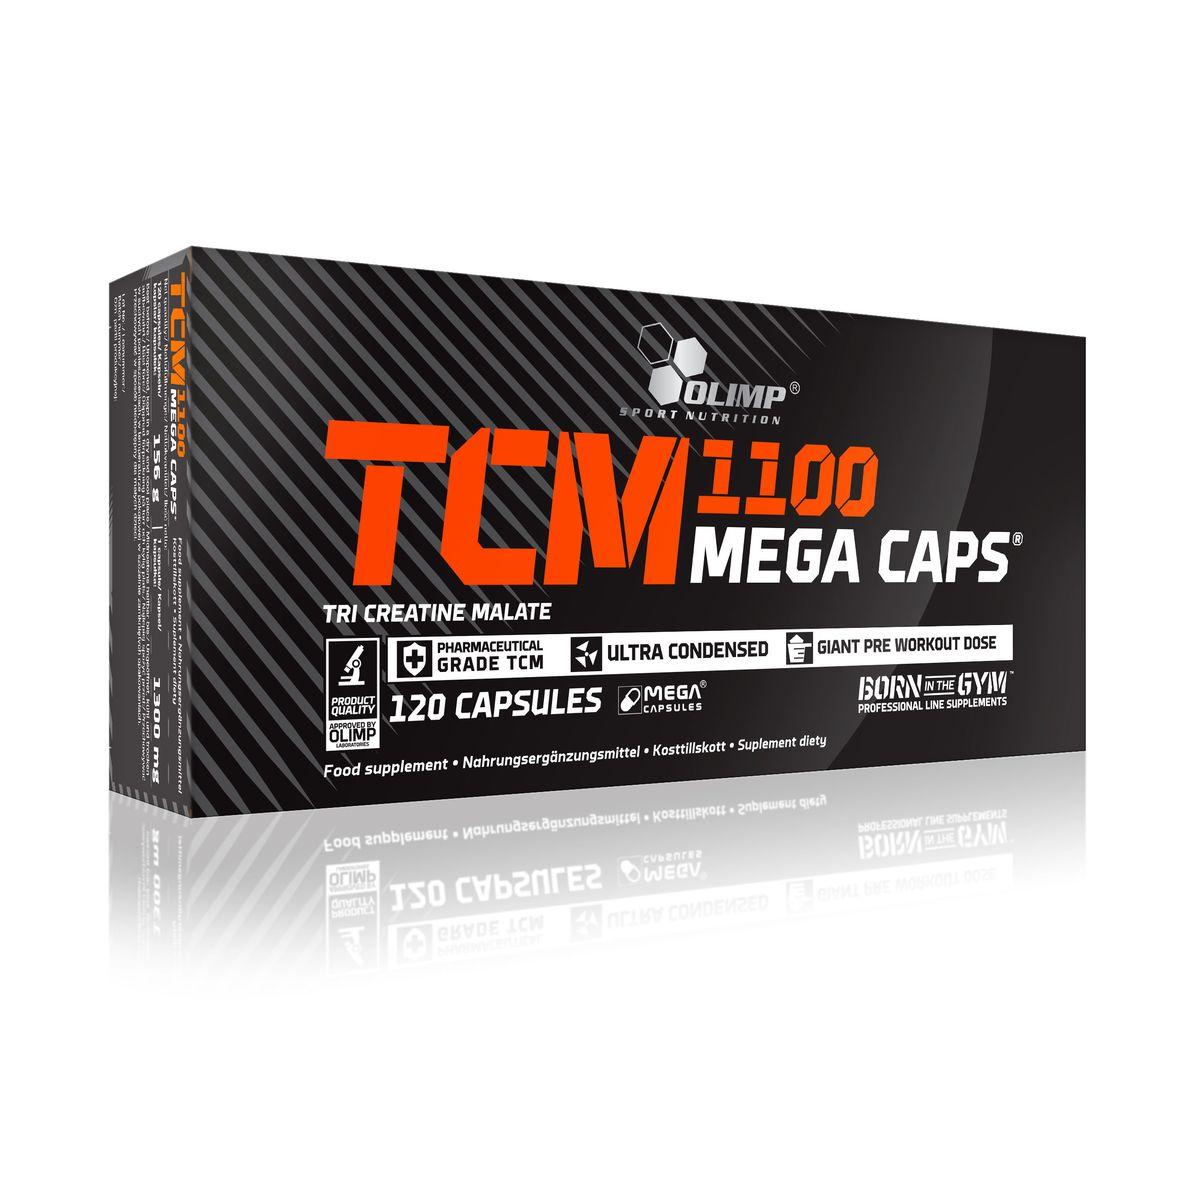 OLIMP Креатин ТСМ мега капс, 120 капс ( O20520 )